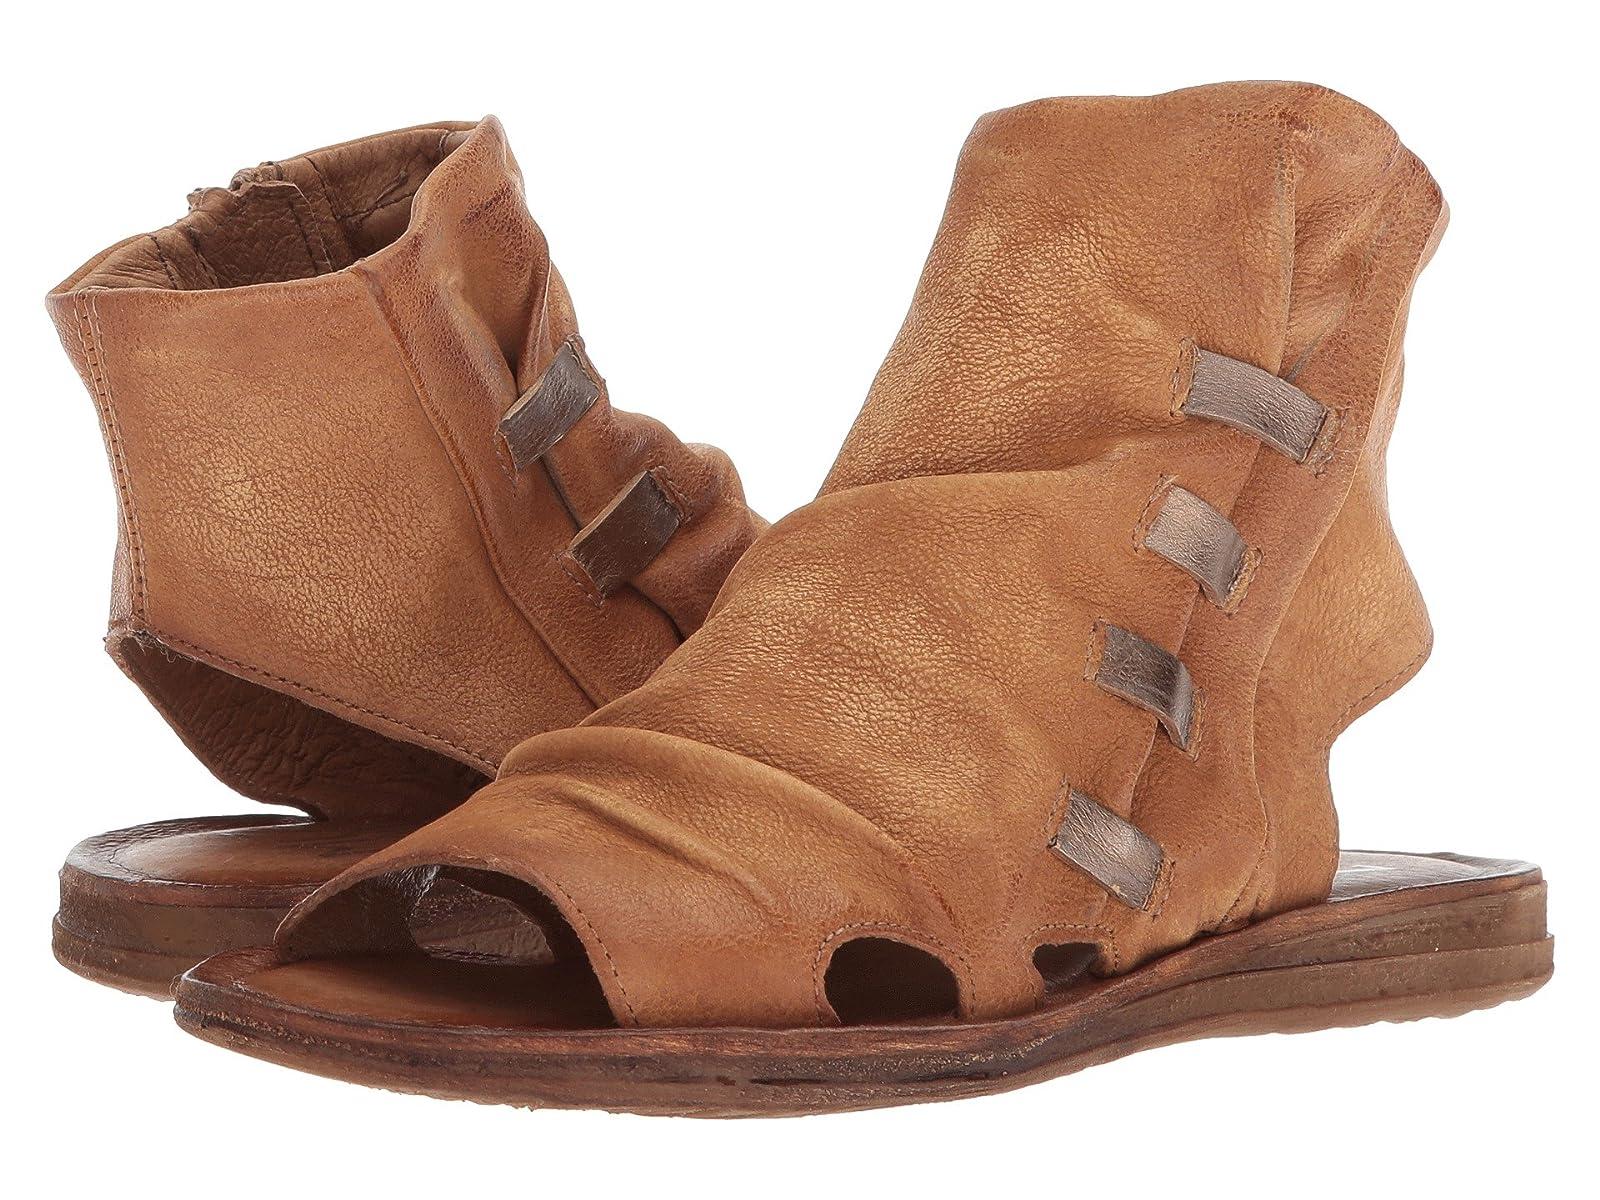 Miz Mooz FizzyAtmospheric grades have affordable shoes